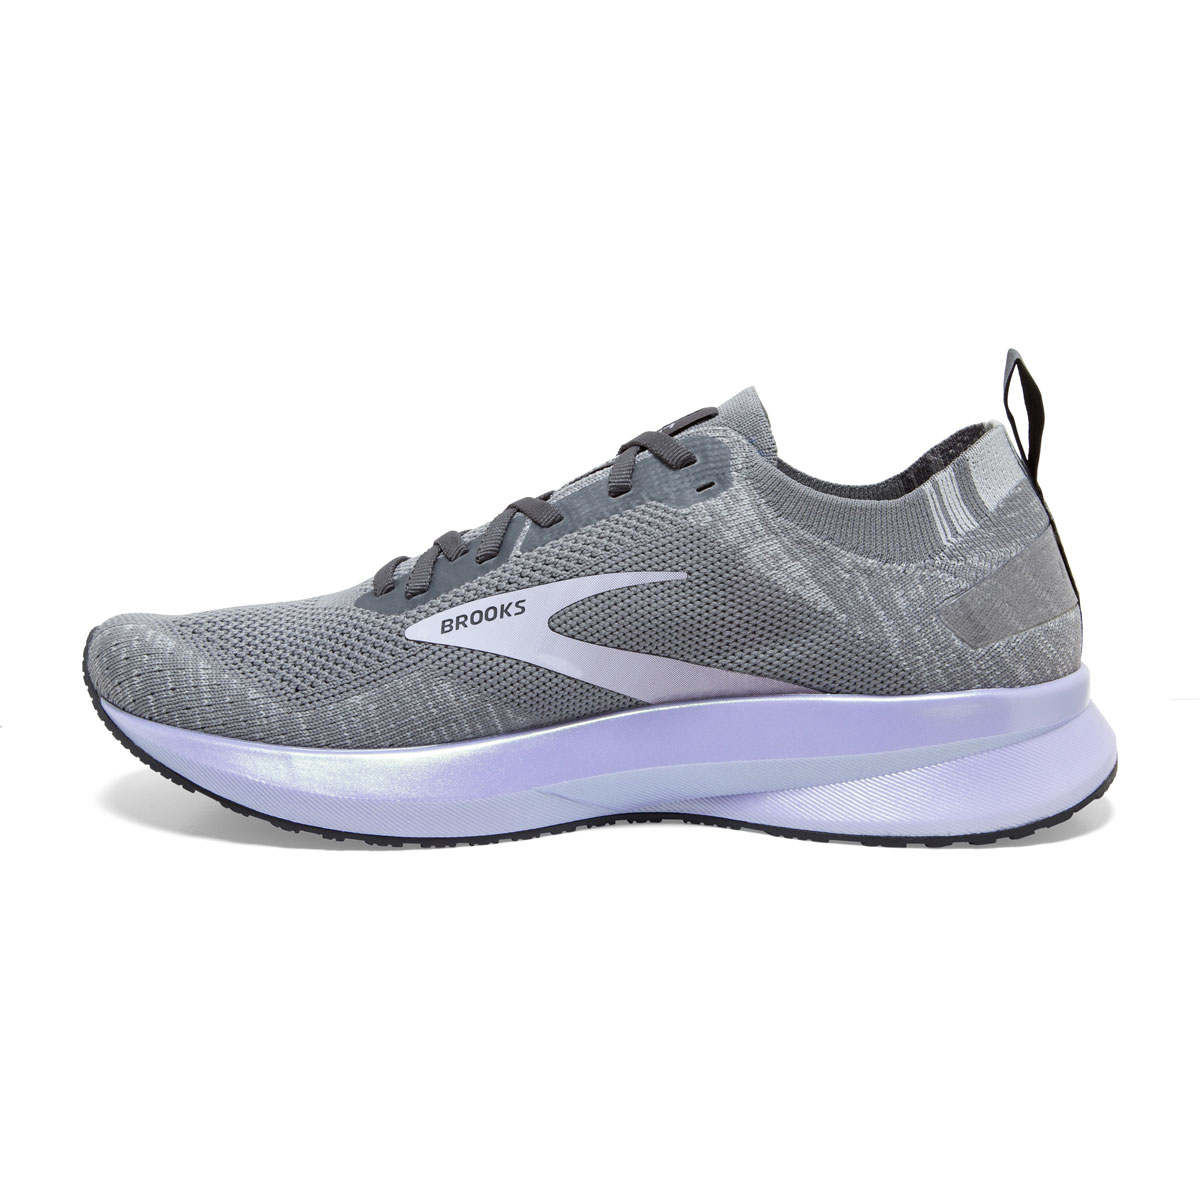 Women's Brooks Levitate 4 Running Shoe - Color: Grey/Blackened Pearl/Purple - Size: 5 - Width: Regular, Grey/Blackened Pearl/Purple, large, image 3